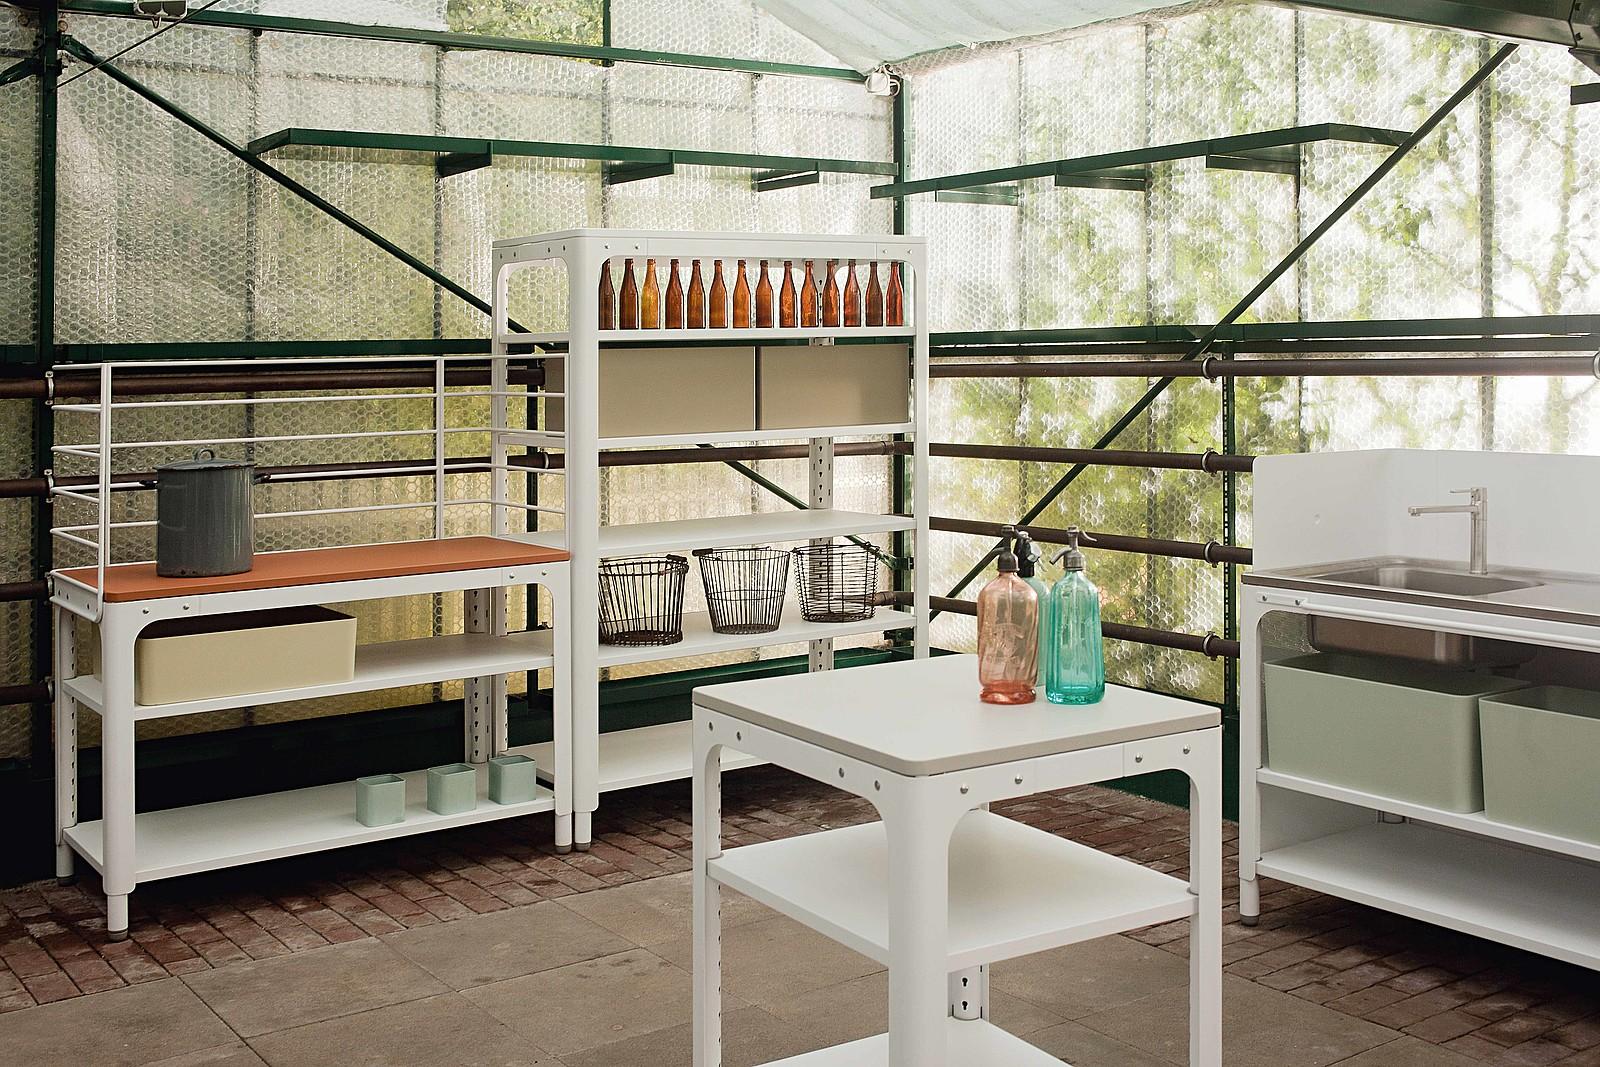 Full Size of Mobile Outdoorküche Küche Wohnzimmer Mobile Outdoorküche